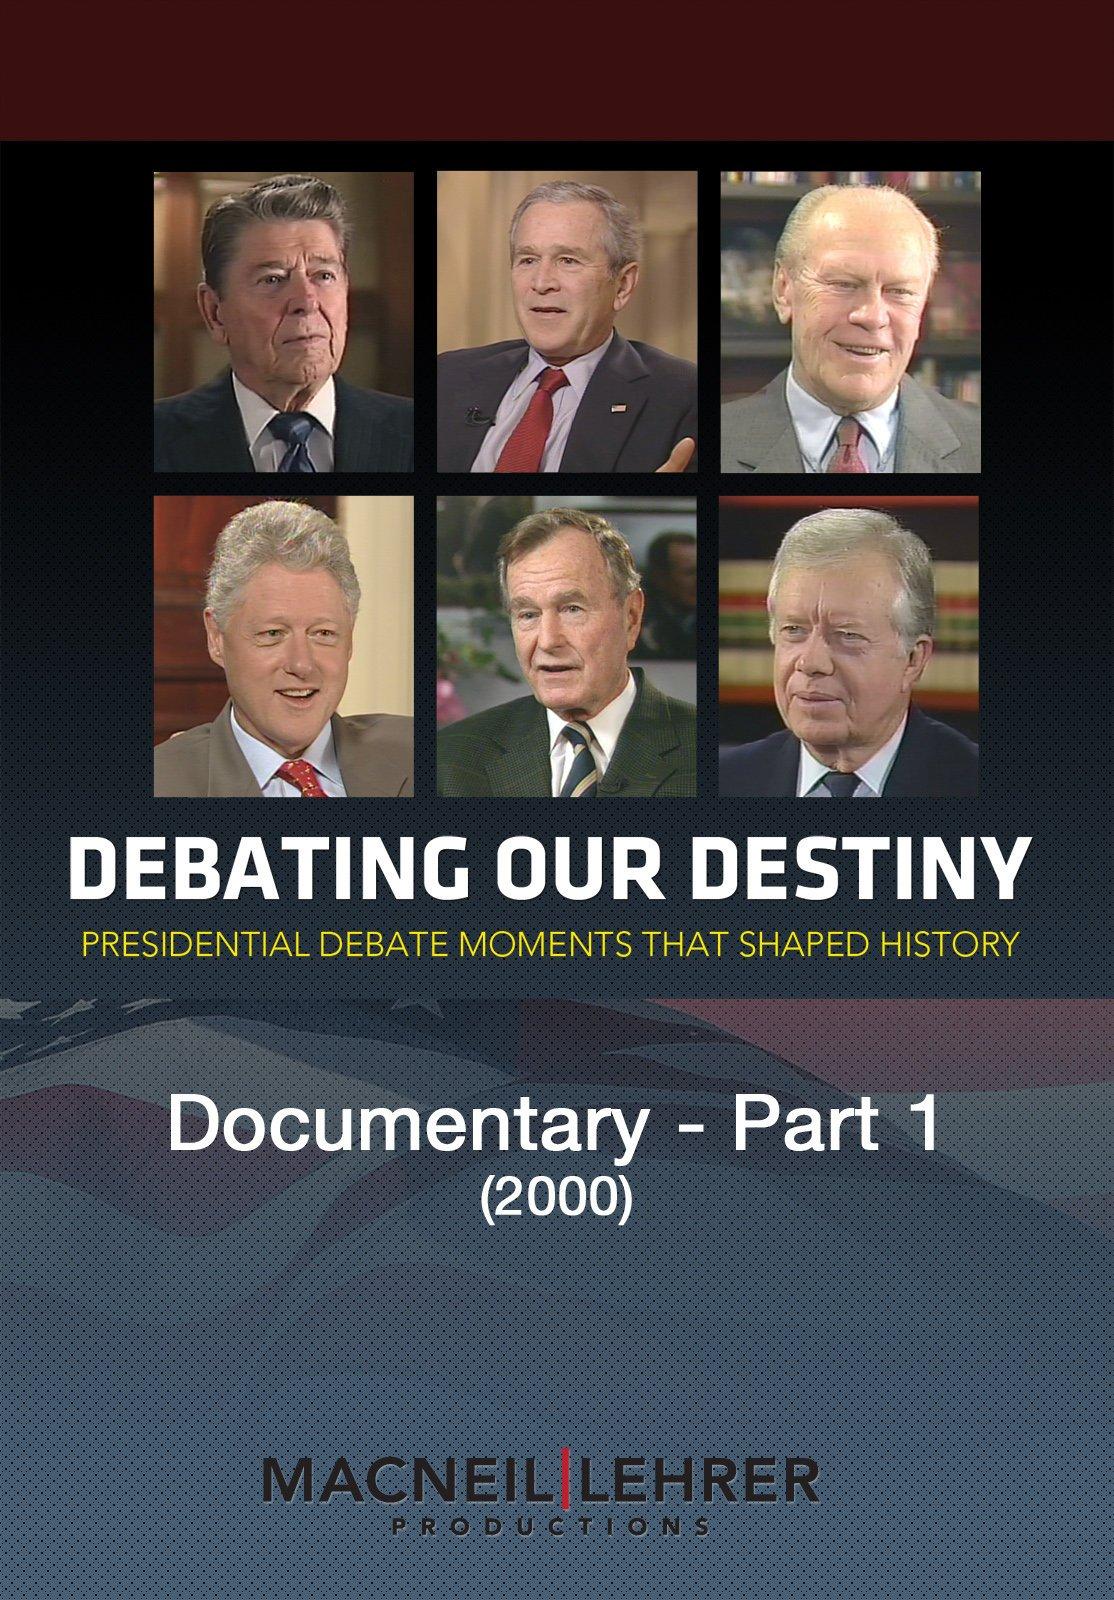 Amazon.com: Debating our Destiny documentary - Part 1: MacNeil/Lehrer Productions: Amazon Digital Services LLC